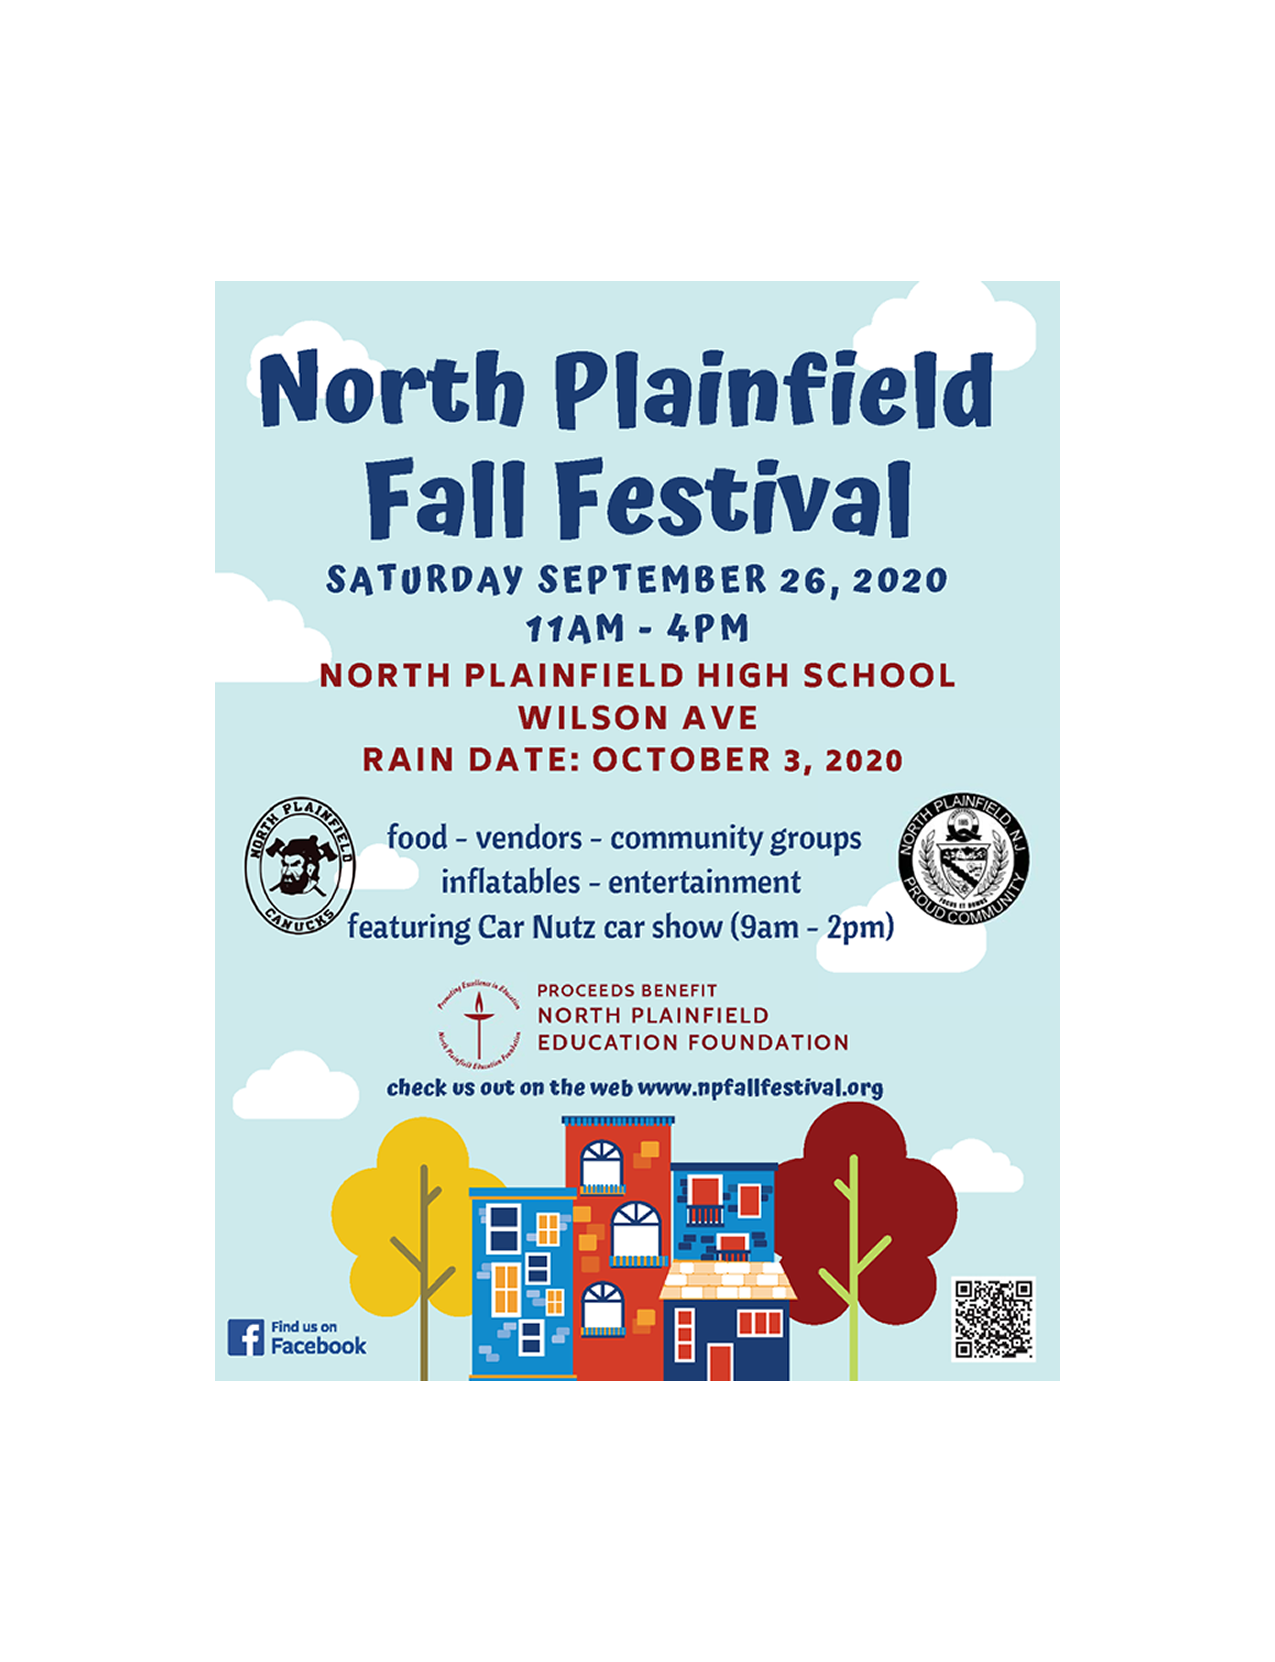 North Plainfield Fall Festival